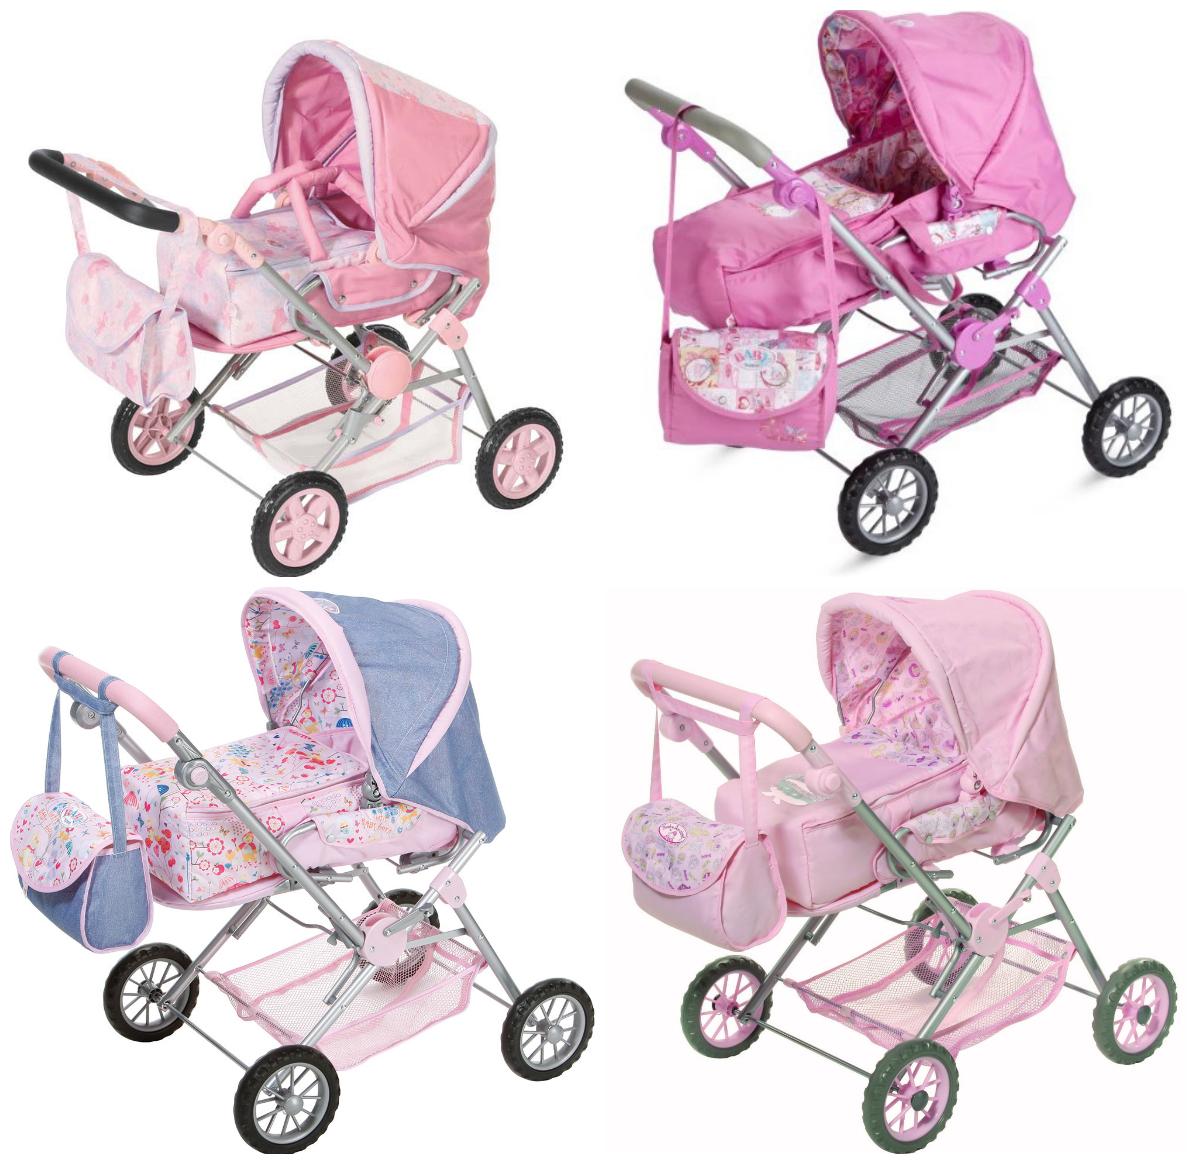 Прогулочная коляска 3 в 1 De Luxe для кукол Baby Born